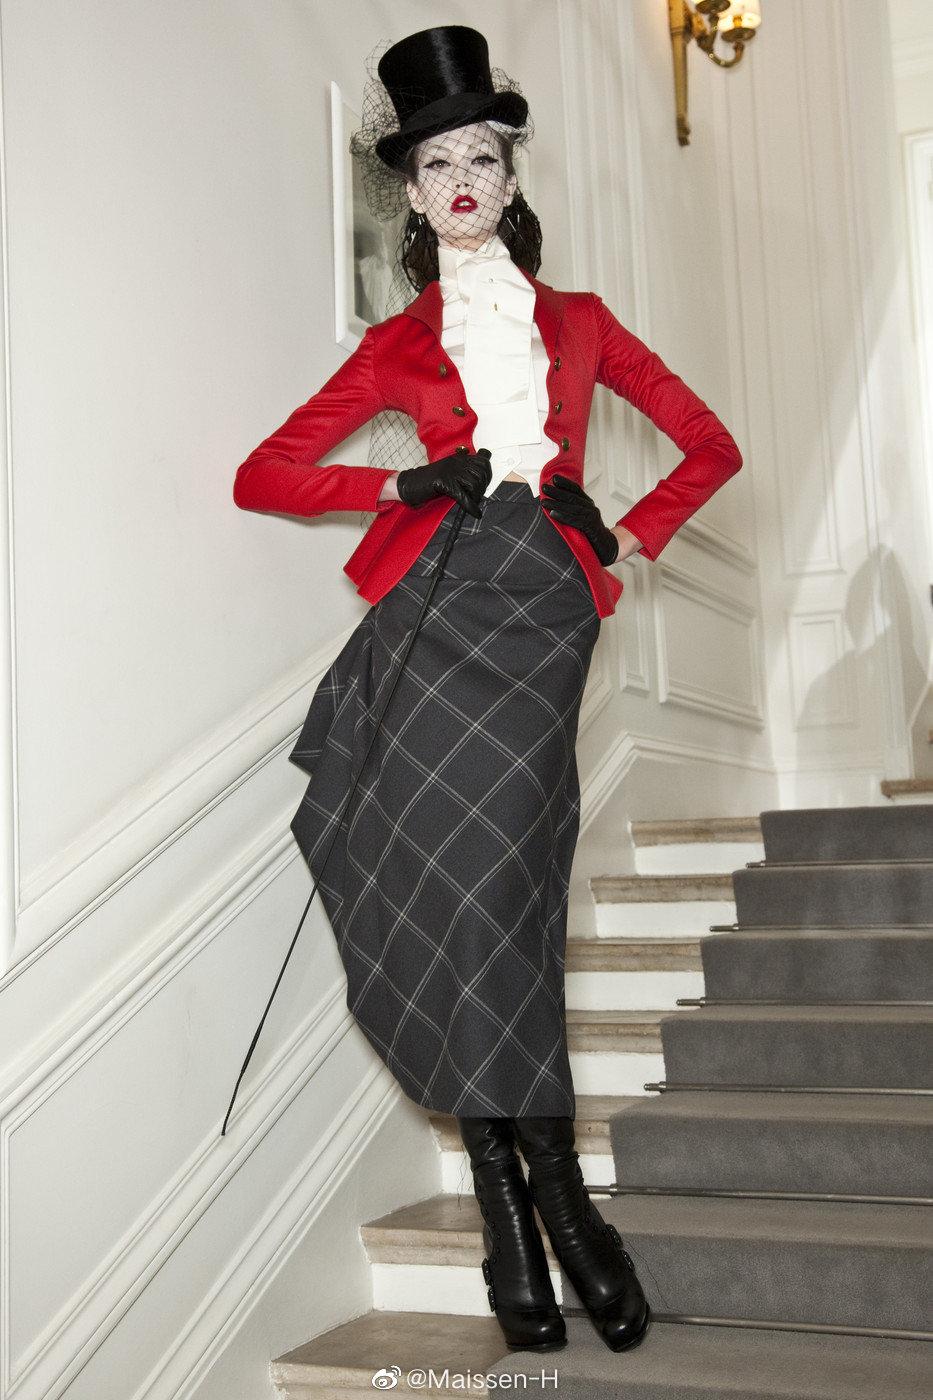 Dior ss 2010 Couture | John Galliano塑造的时代美人~潇洒的骑士装